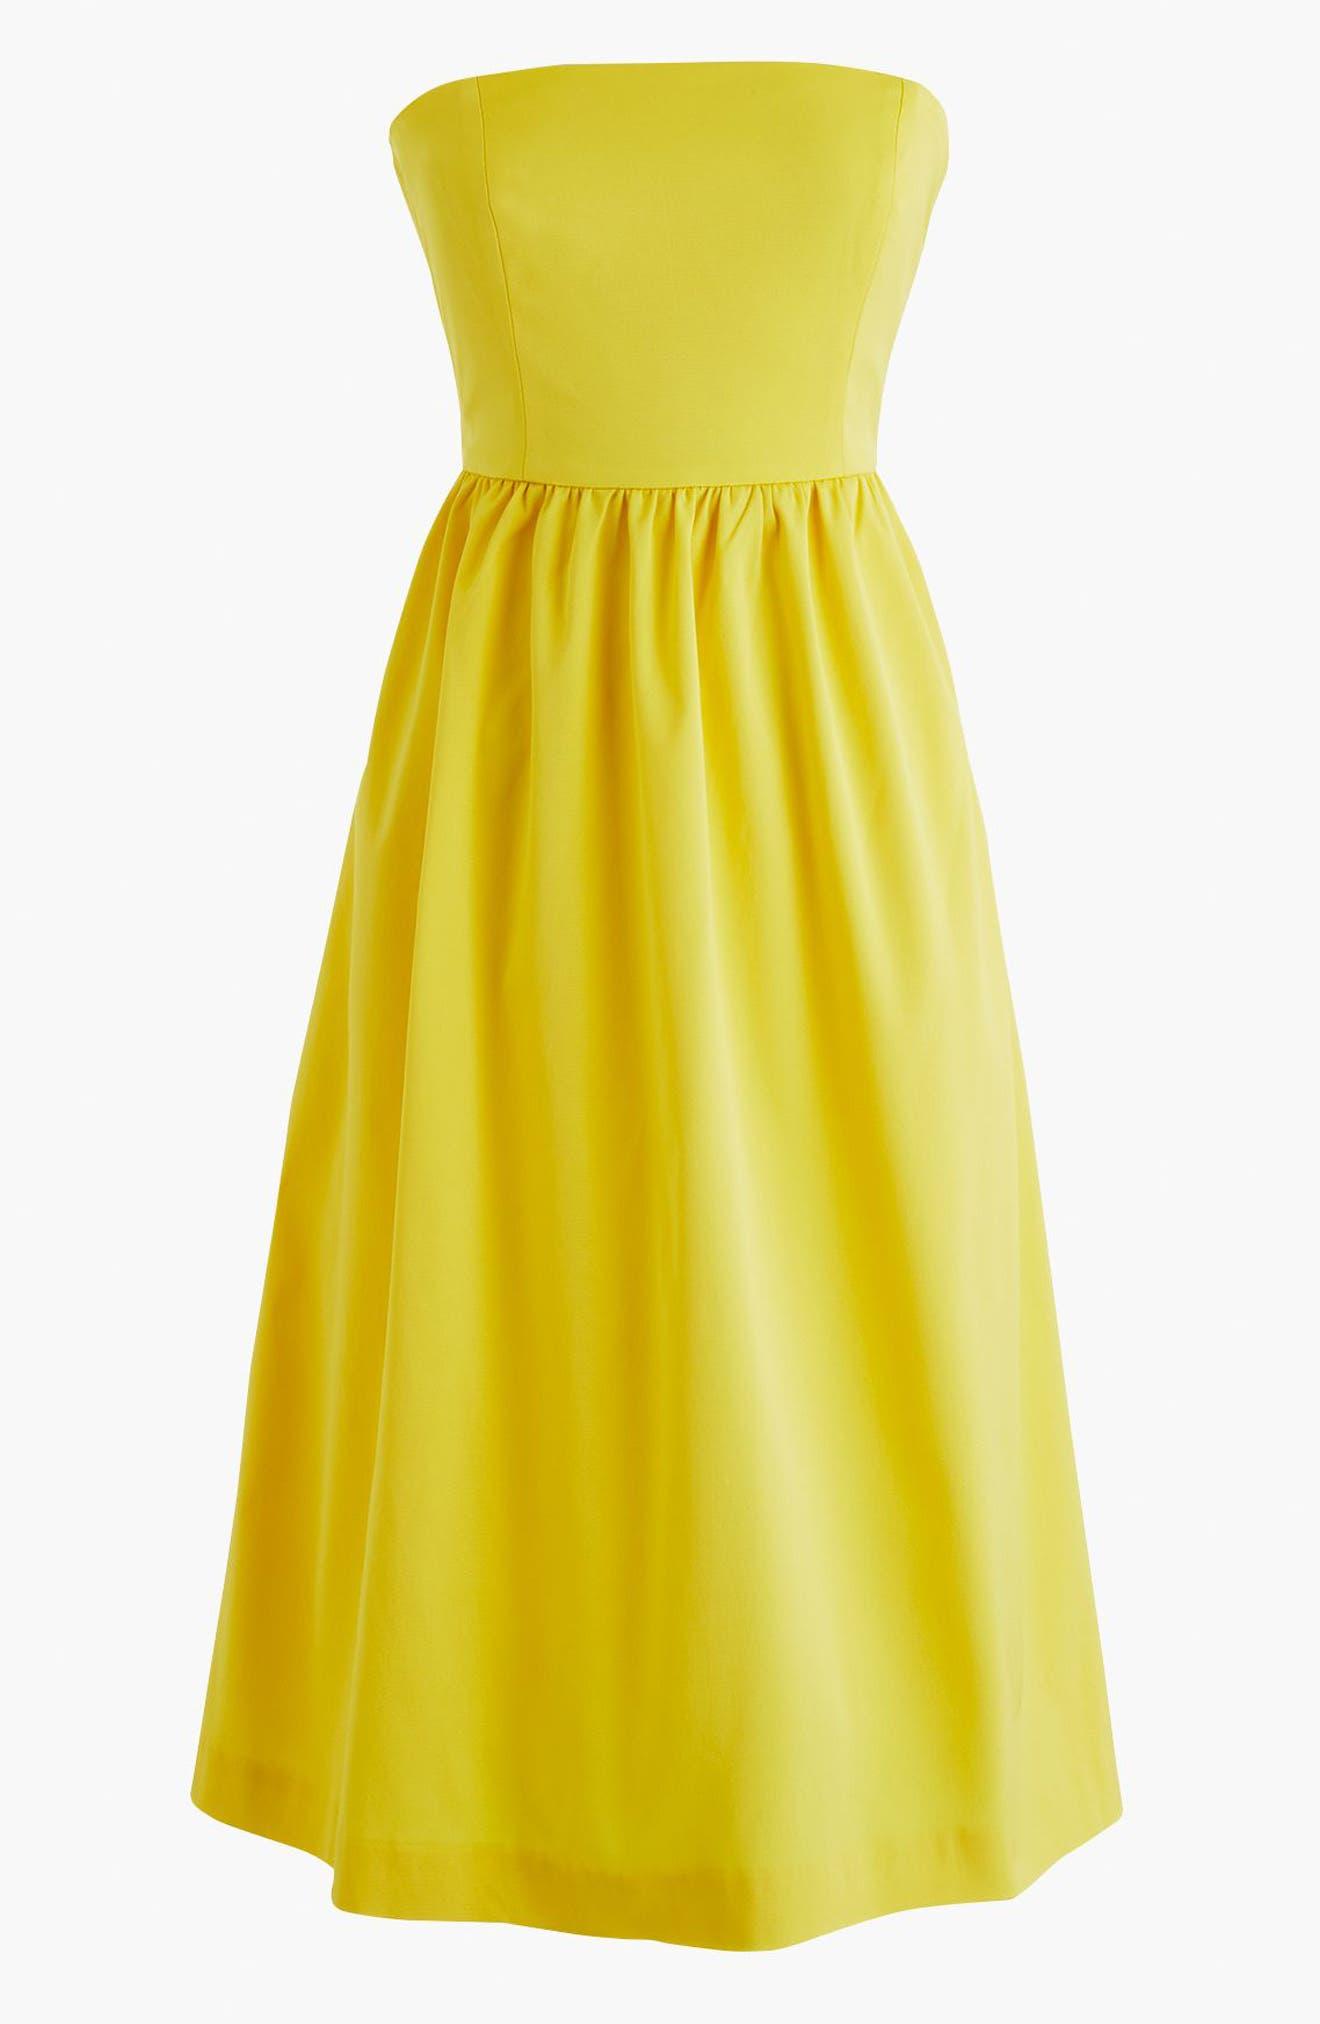 J.Crew Strapless Fit & Flare Dress,                             Alternate thumbnail 4, color,                             Bright Lemon